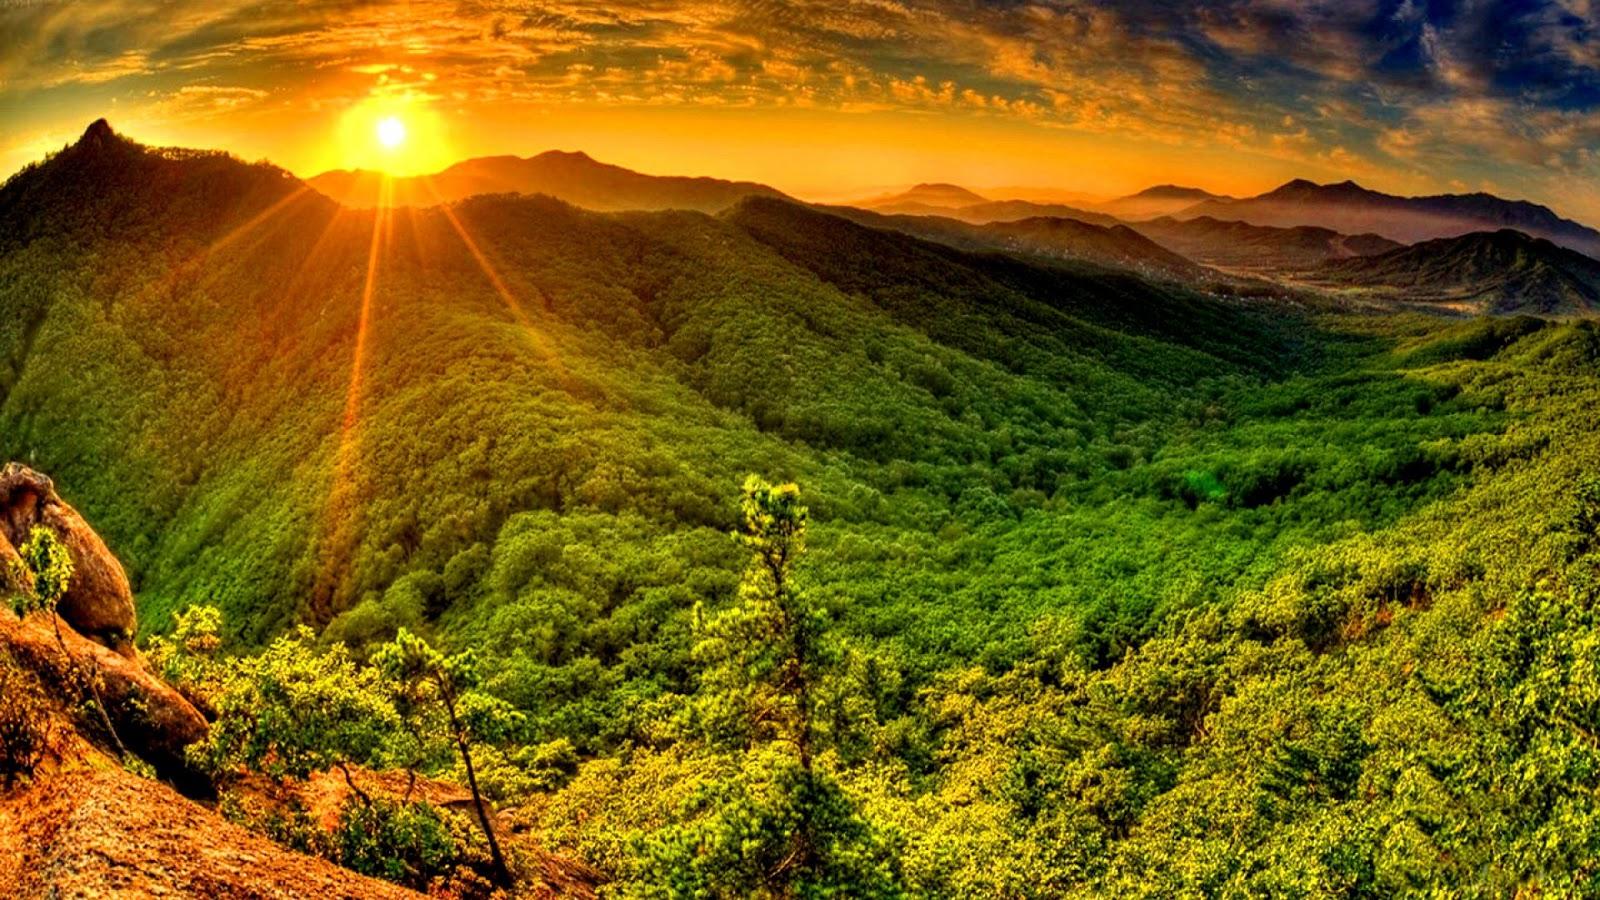 Beautiful Valley Wallpapers - Beautiful Desktop HD Wallpapers Download